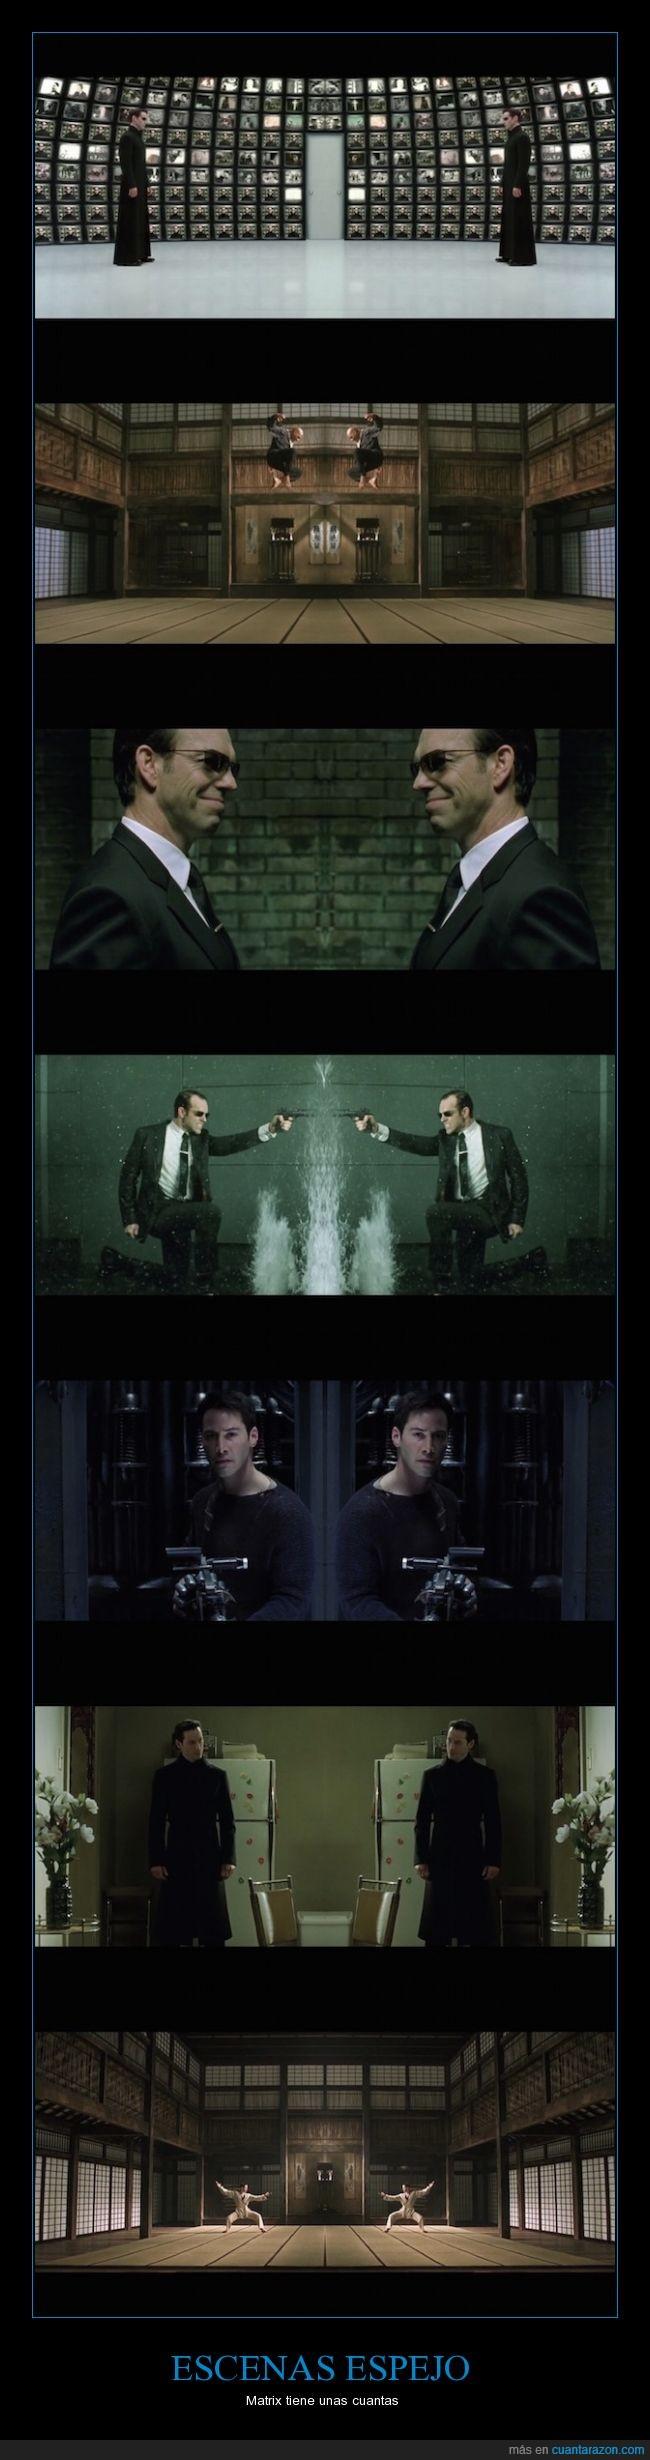 escenas,espejo,matrix,película